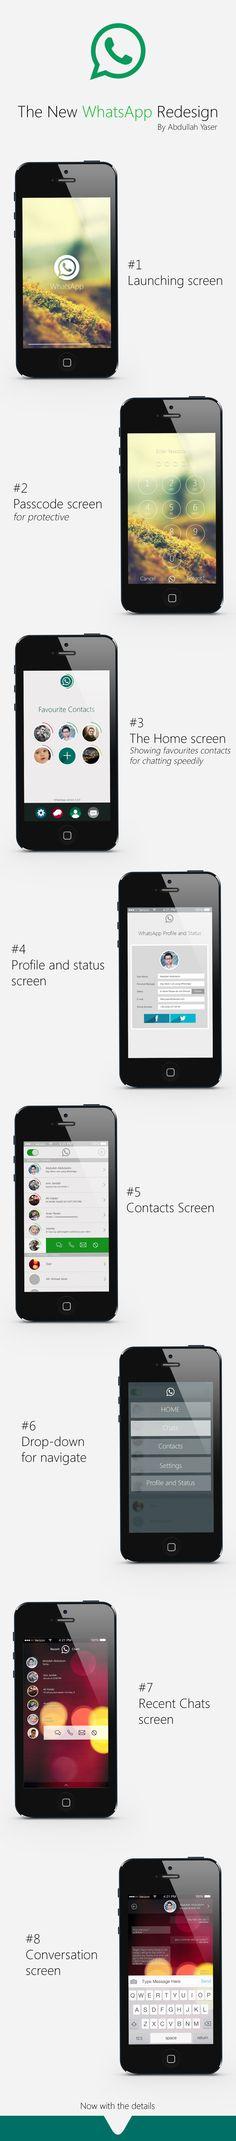 WhatsApp Redesign by Abdullah yaser, via Behance